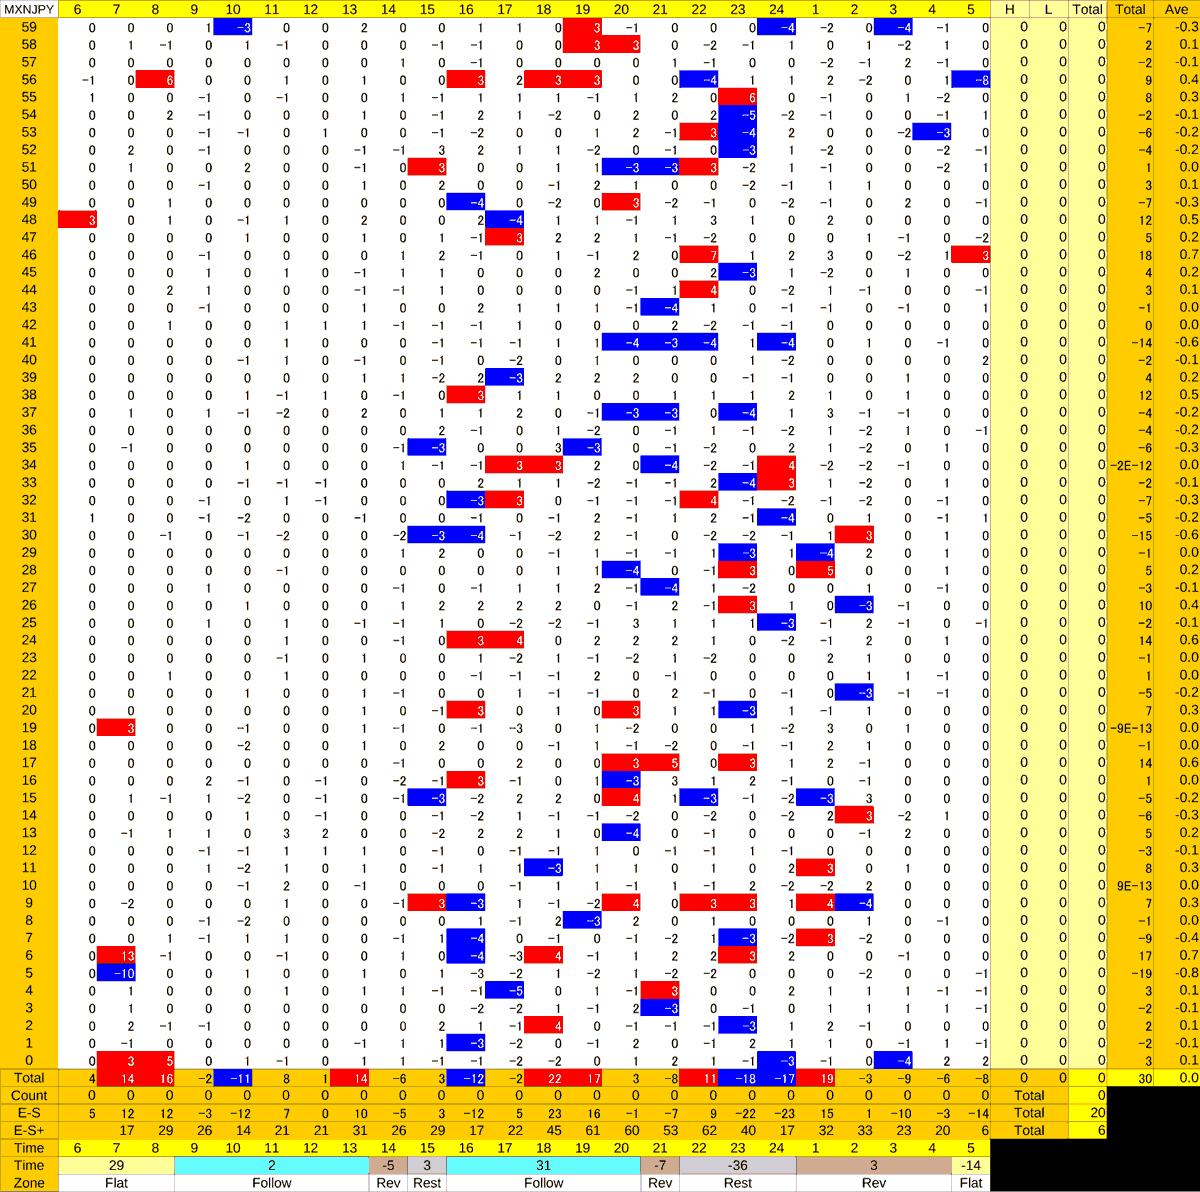 20200929_HS(3)MXNJPY